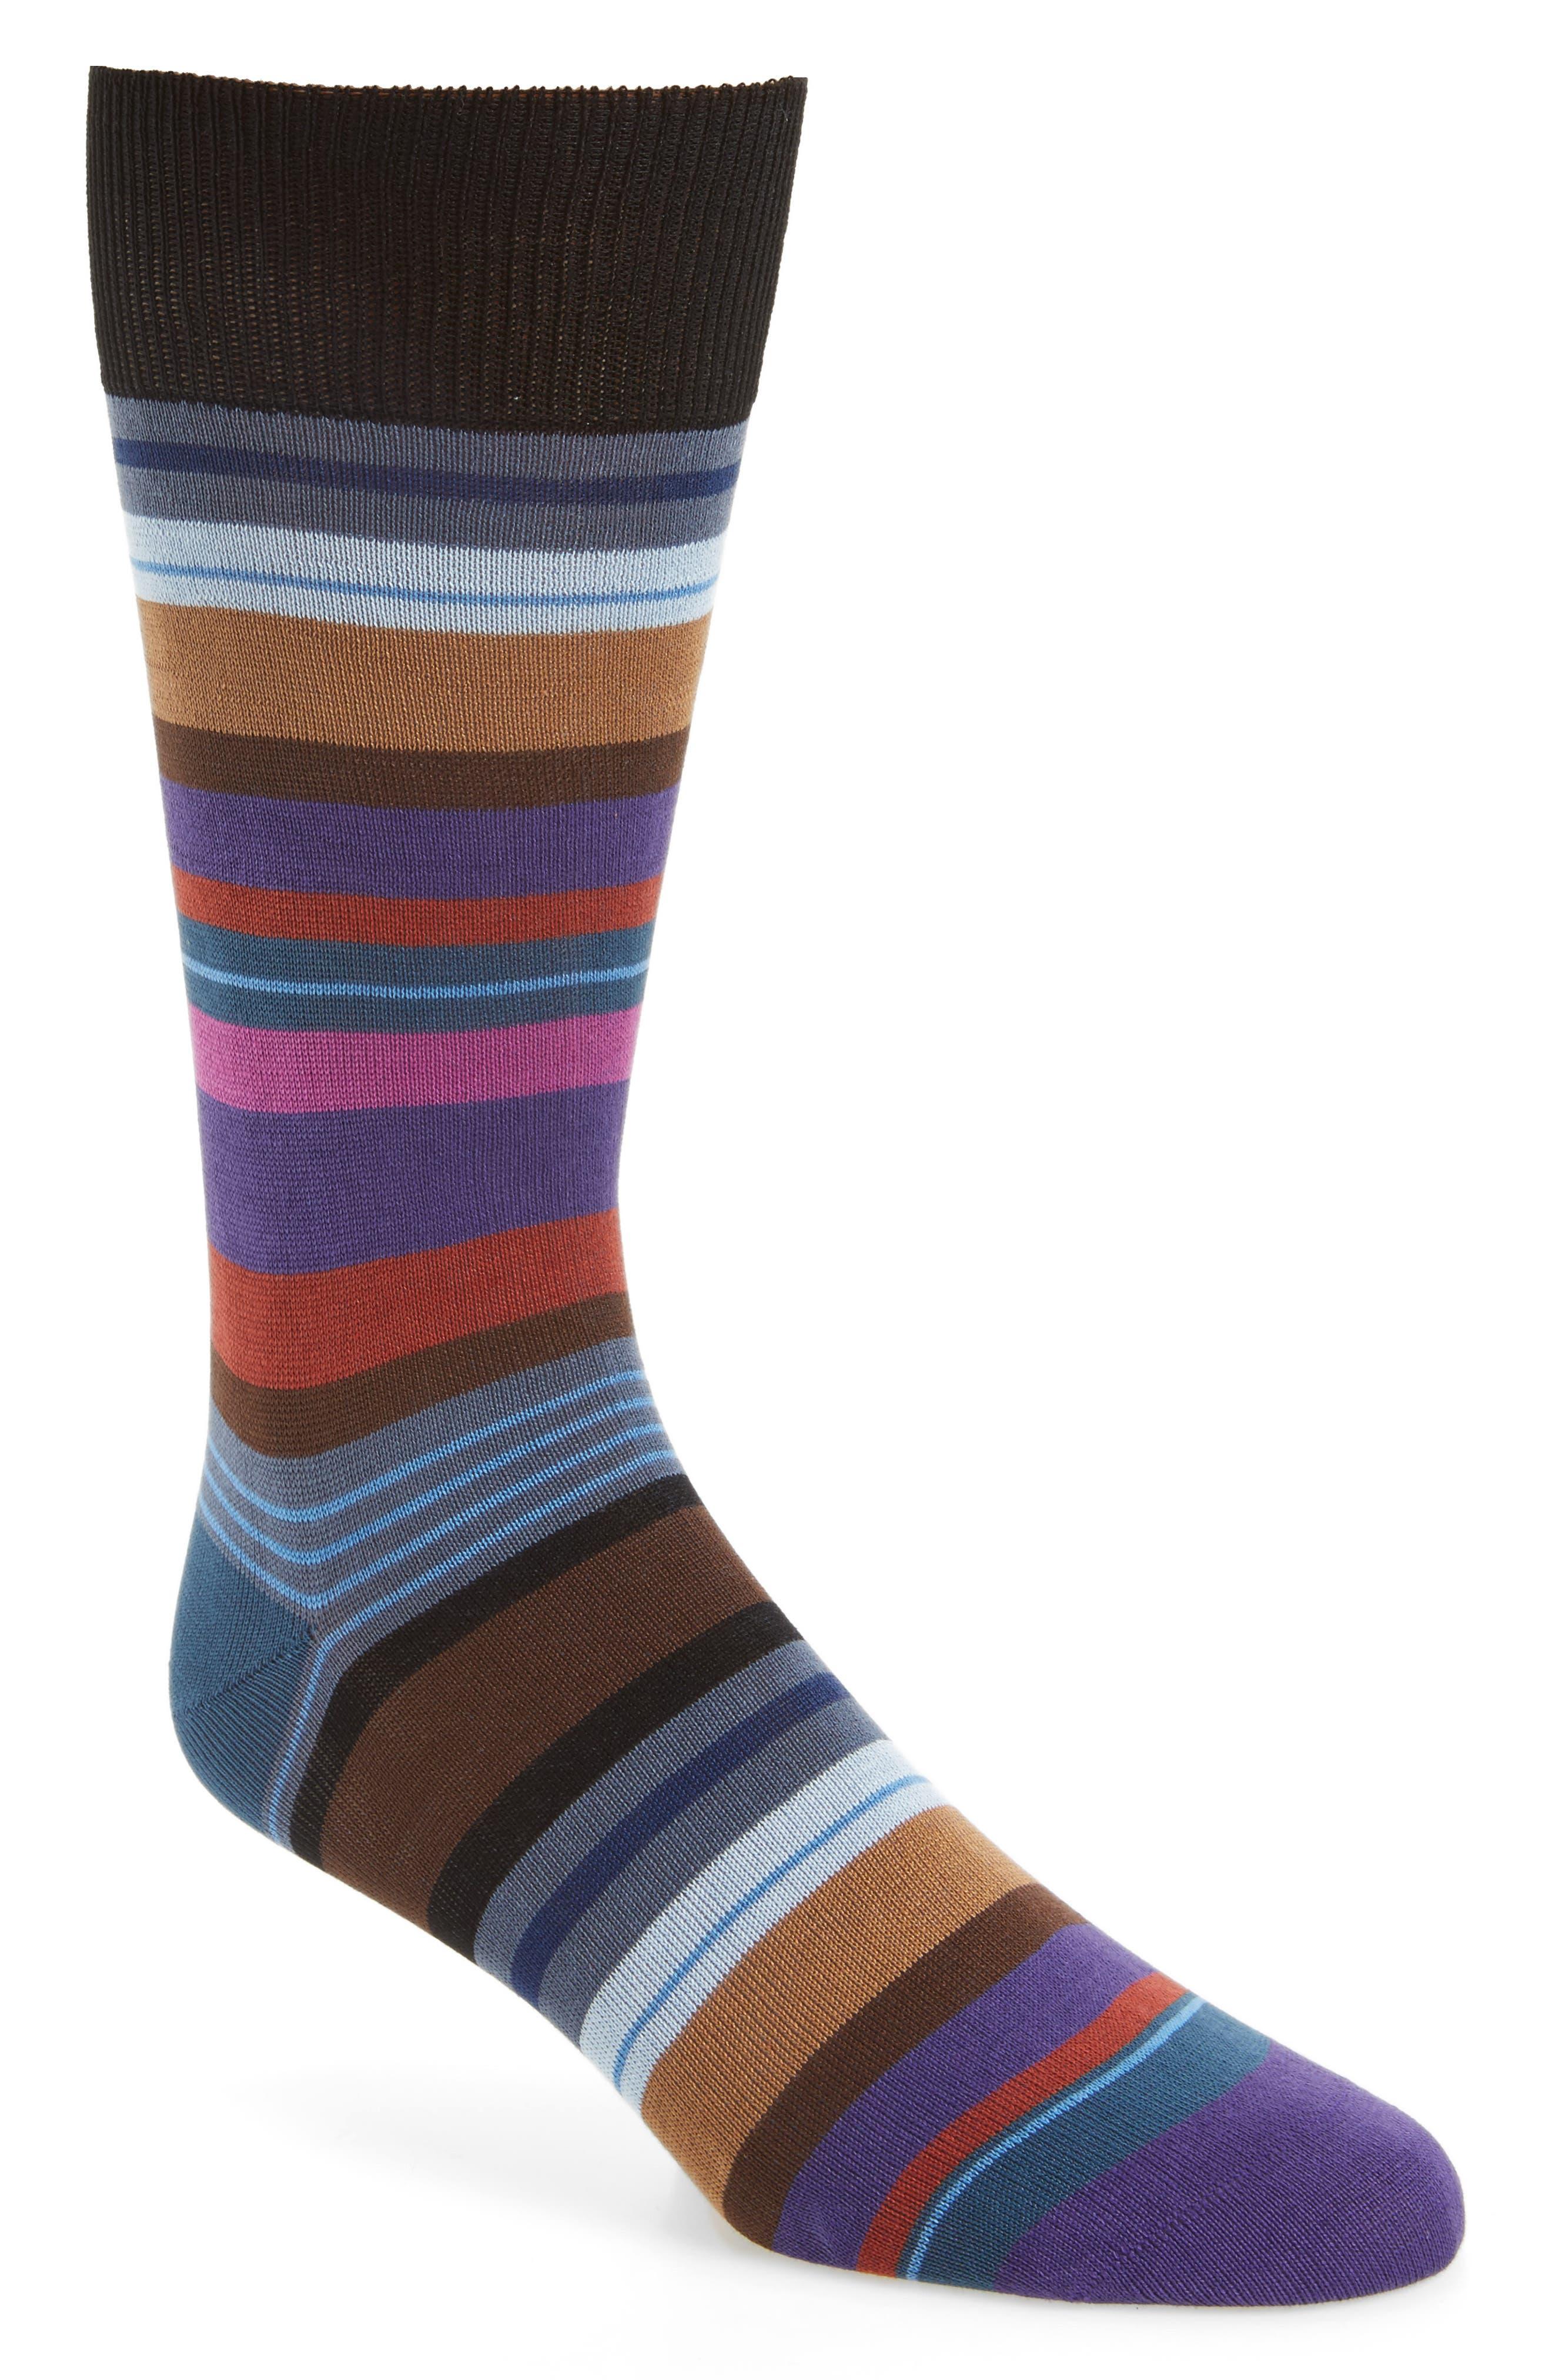 Halentoe Stripe Socks,                             Main thumbnail 1, color,                             001